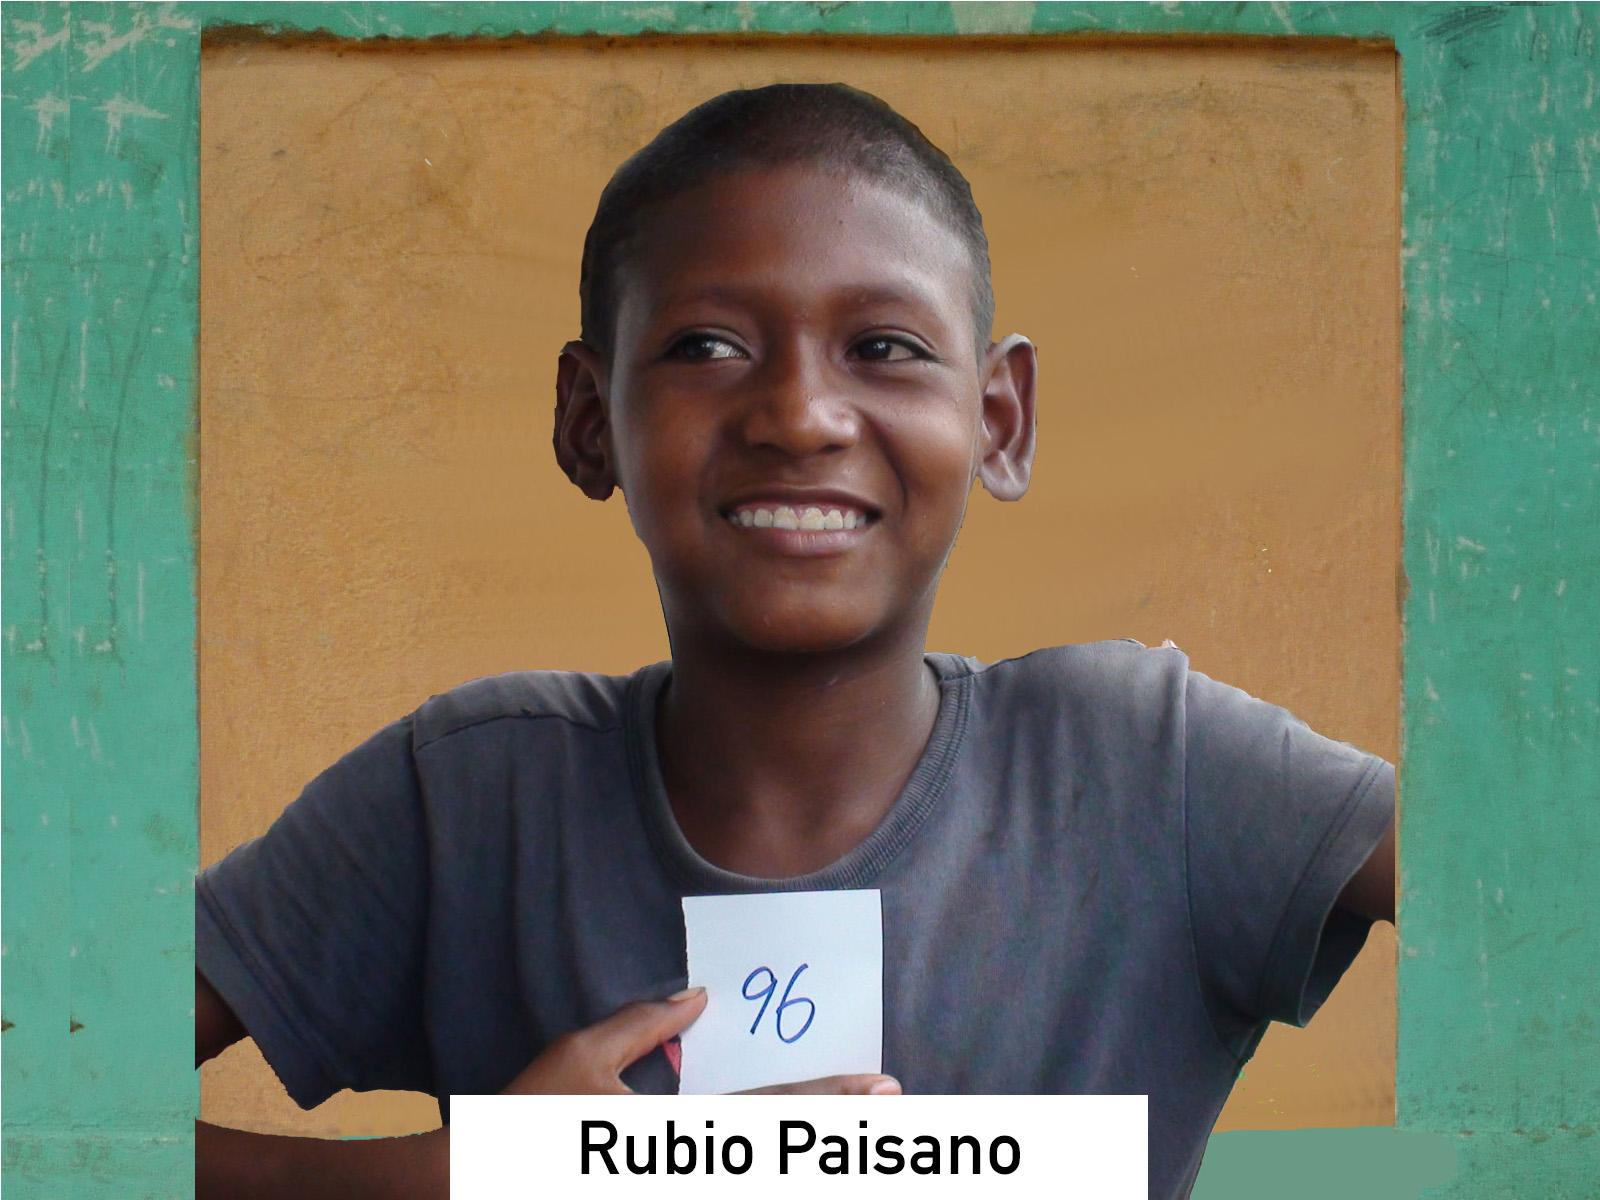 096 - Rubio Paisano.jpg